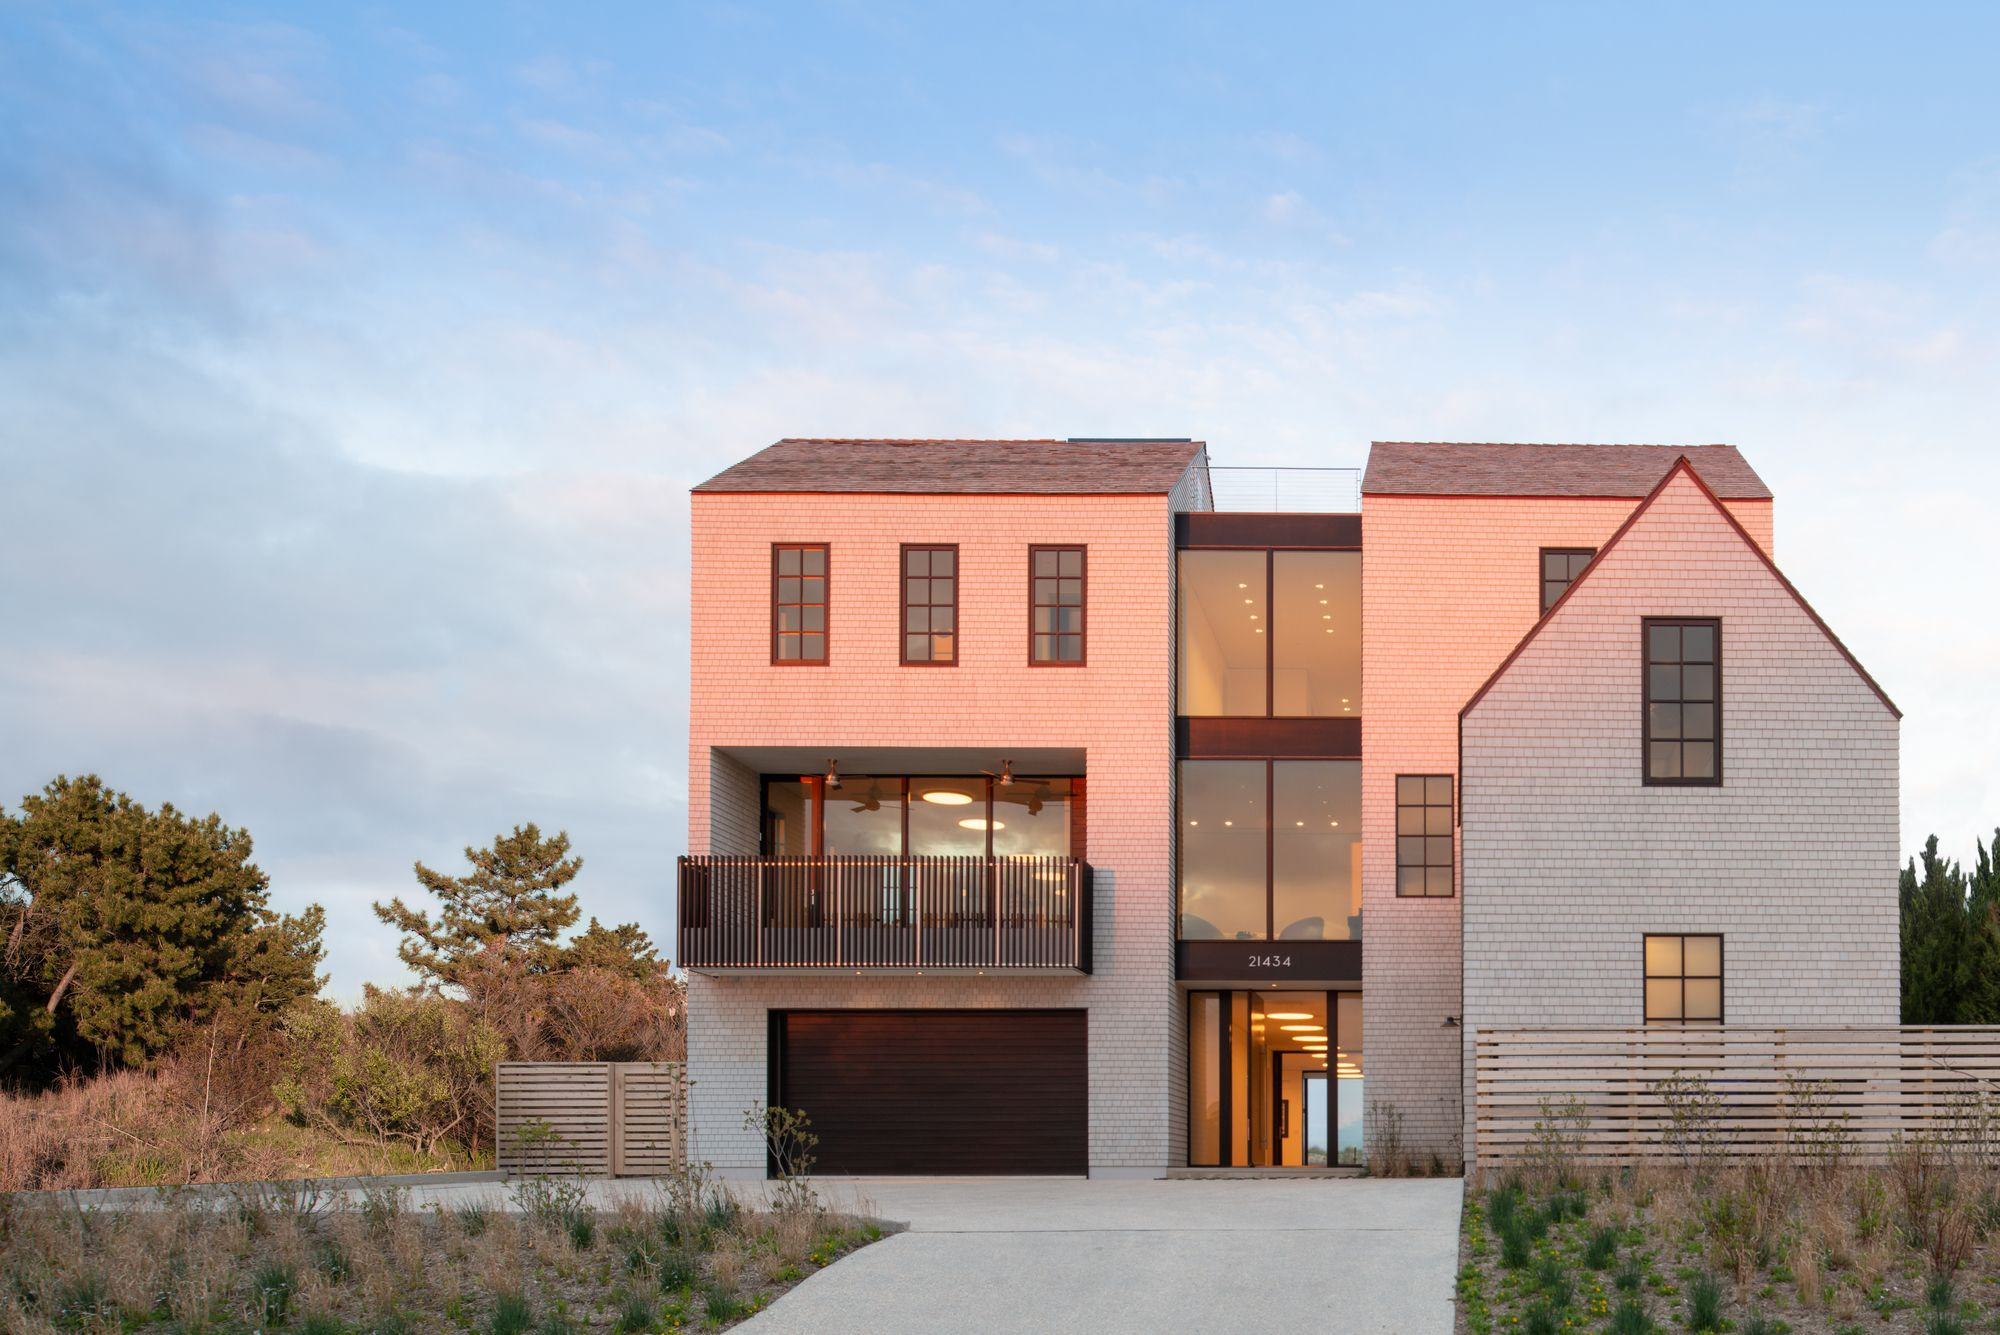 East Lake Beach House Robert M Gurney Faia Architect In 2020 Lake Beach House Architect Lake Beach